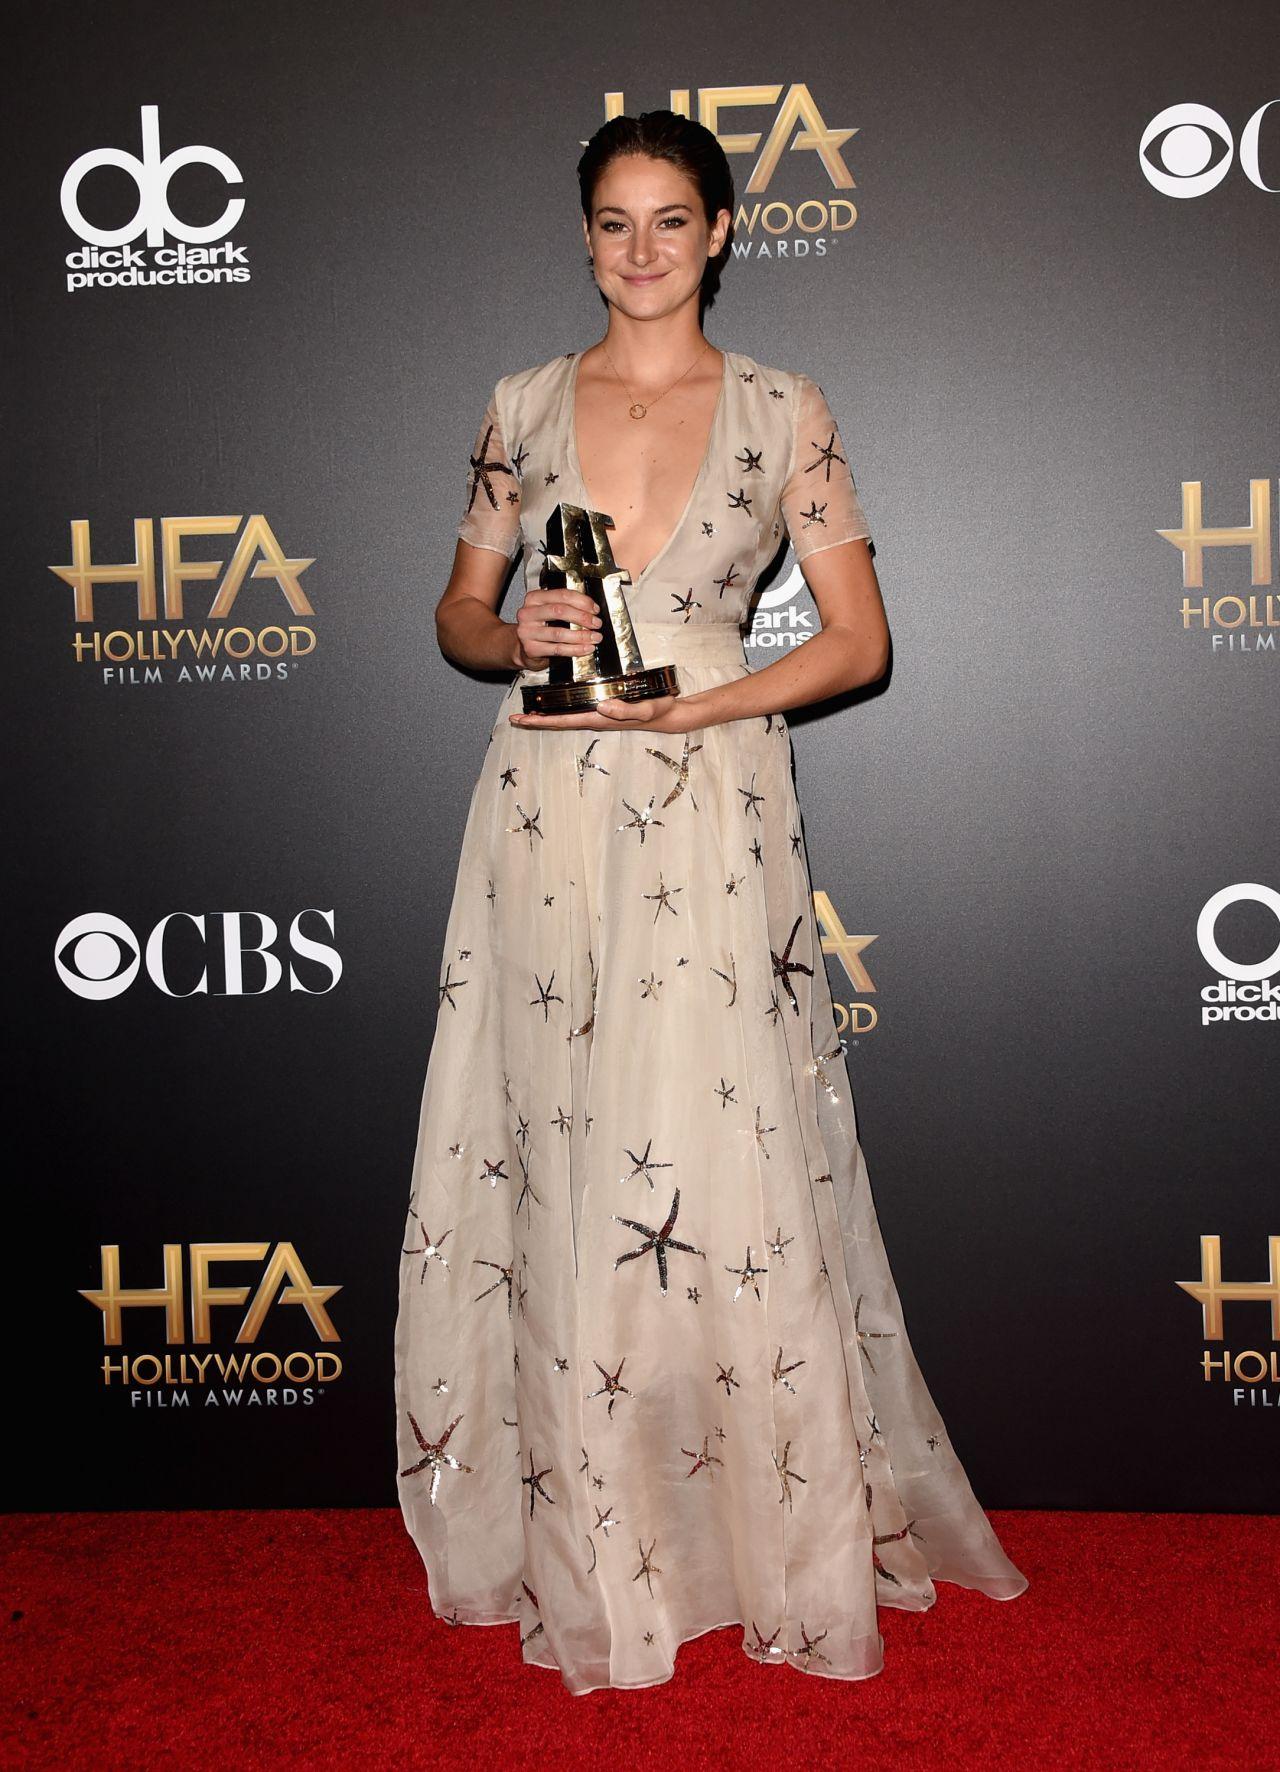 Shailene Woodley 2014 Hollywood Film Awards